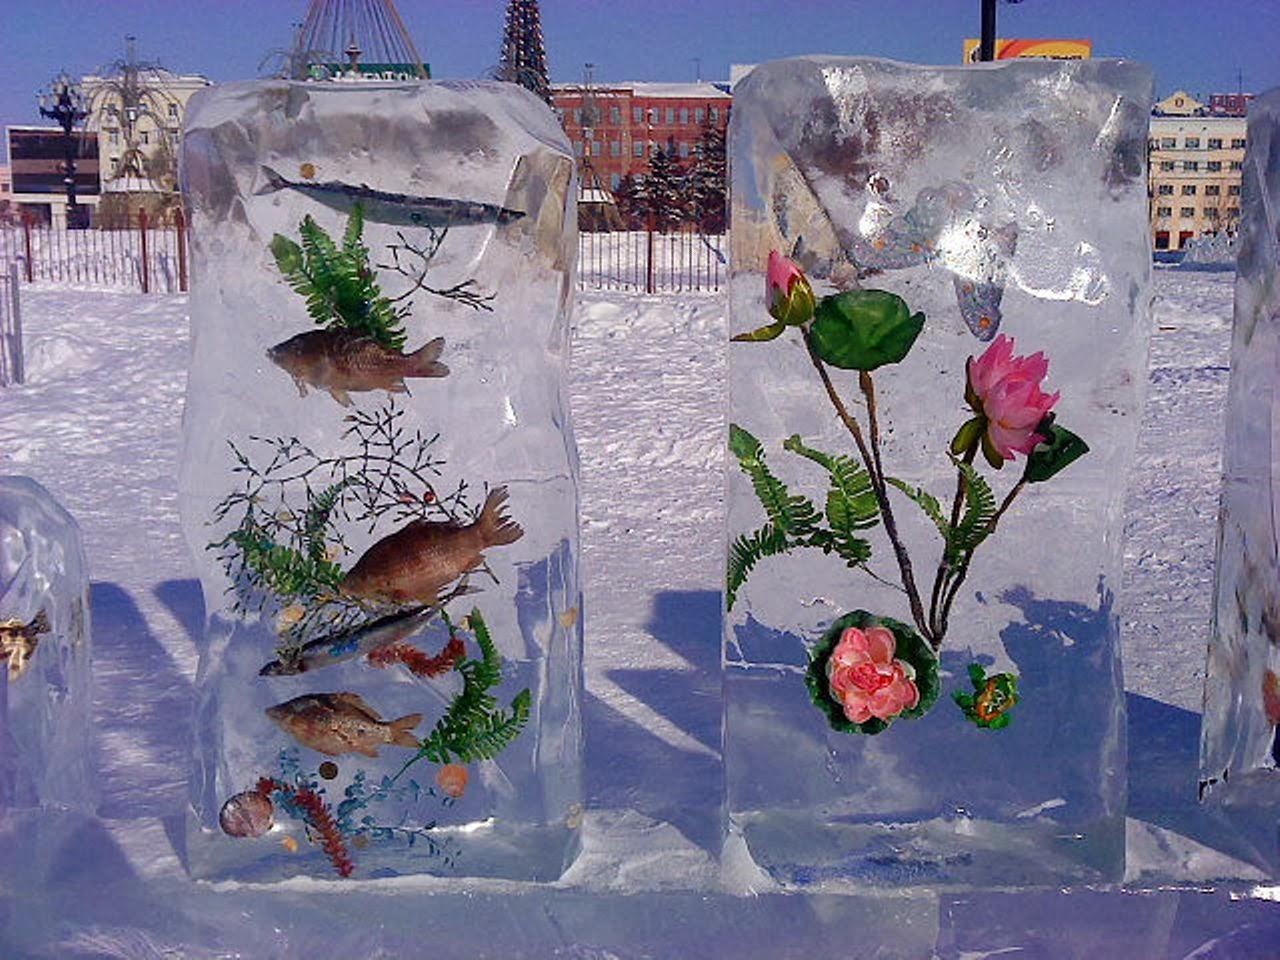 Ледяные фигурки своими руками